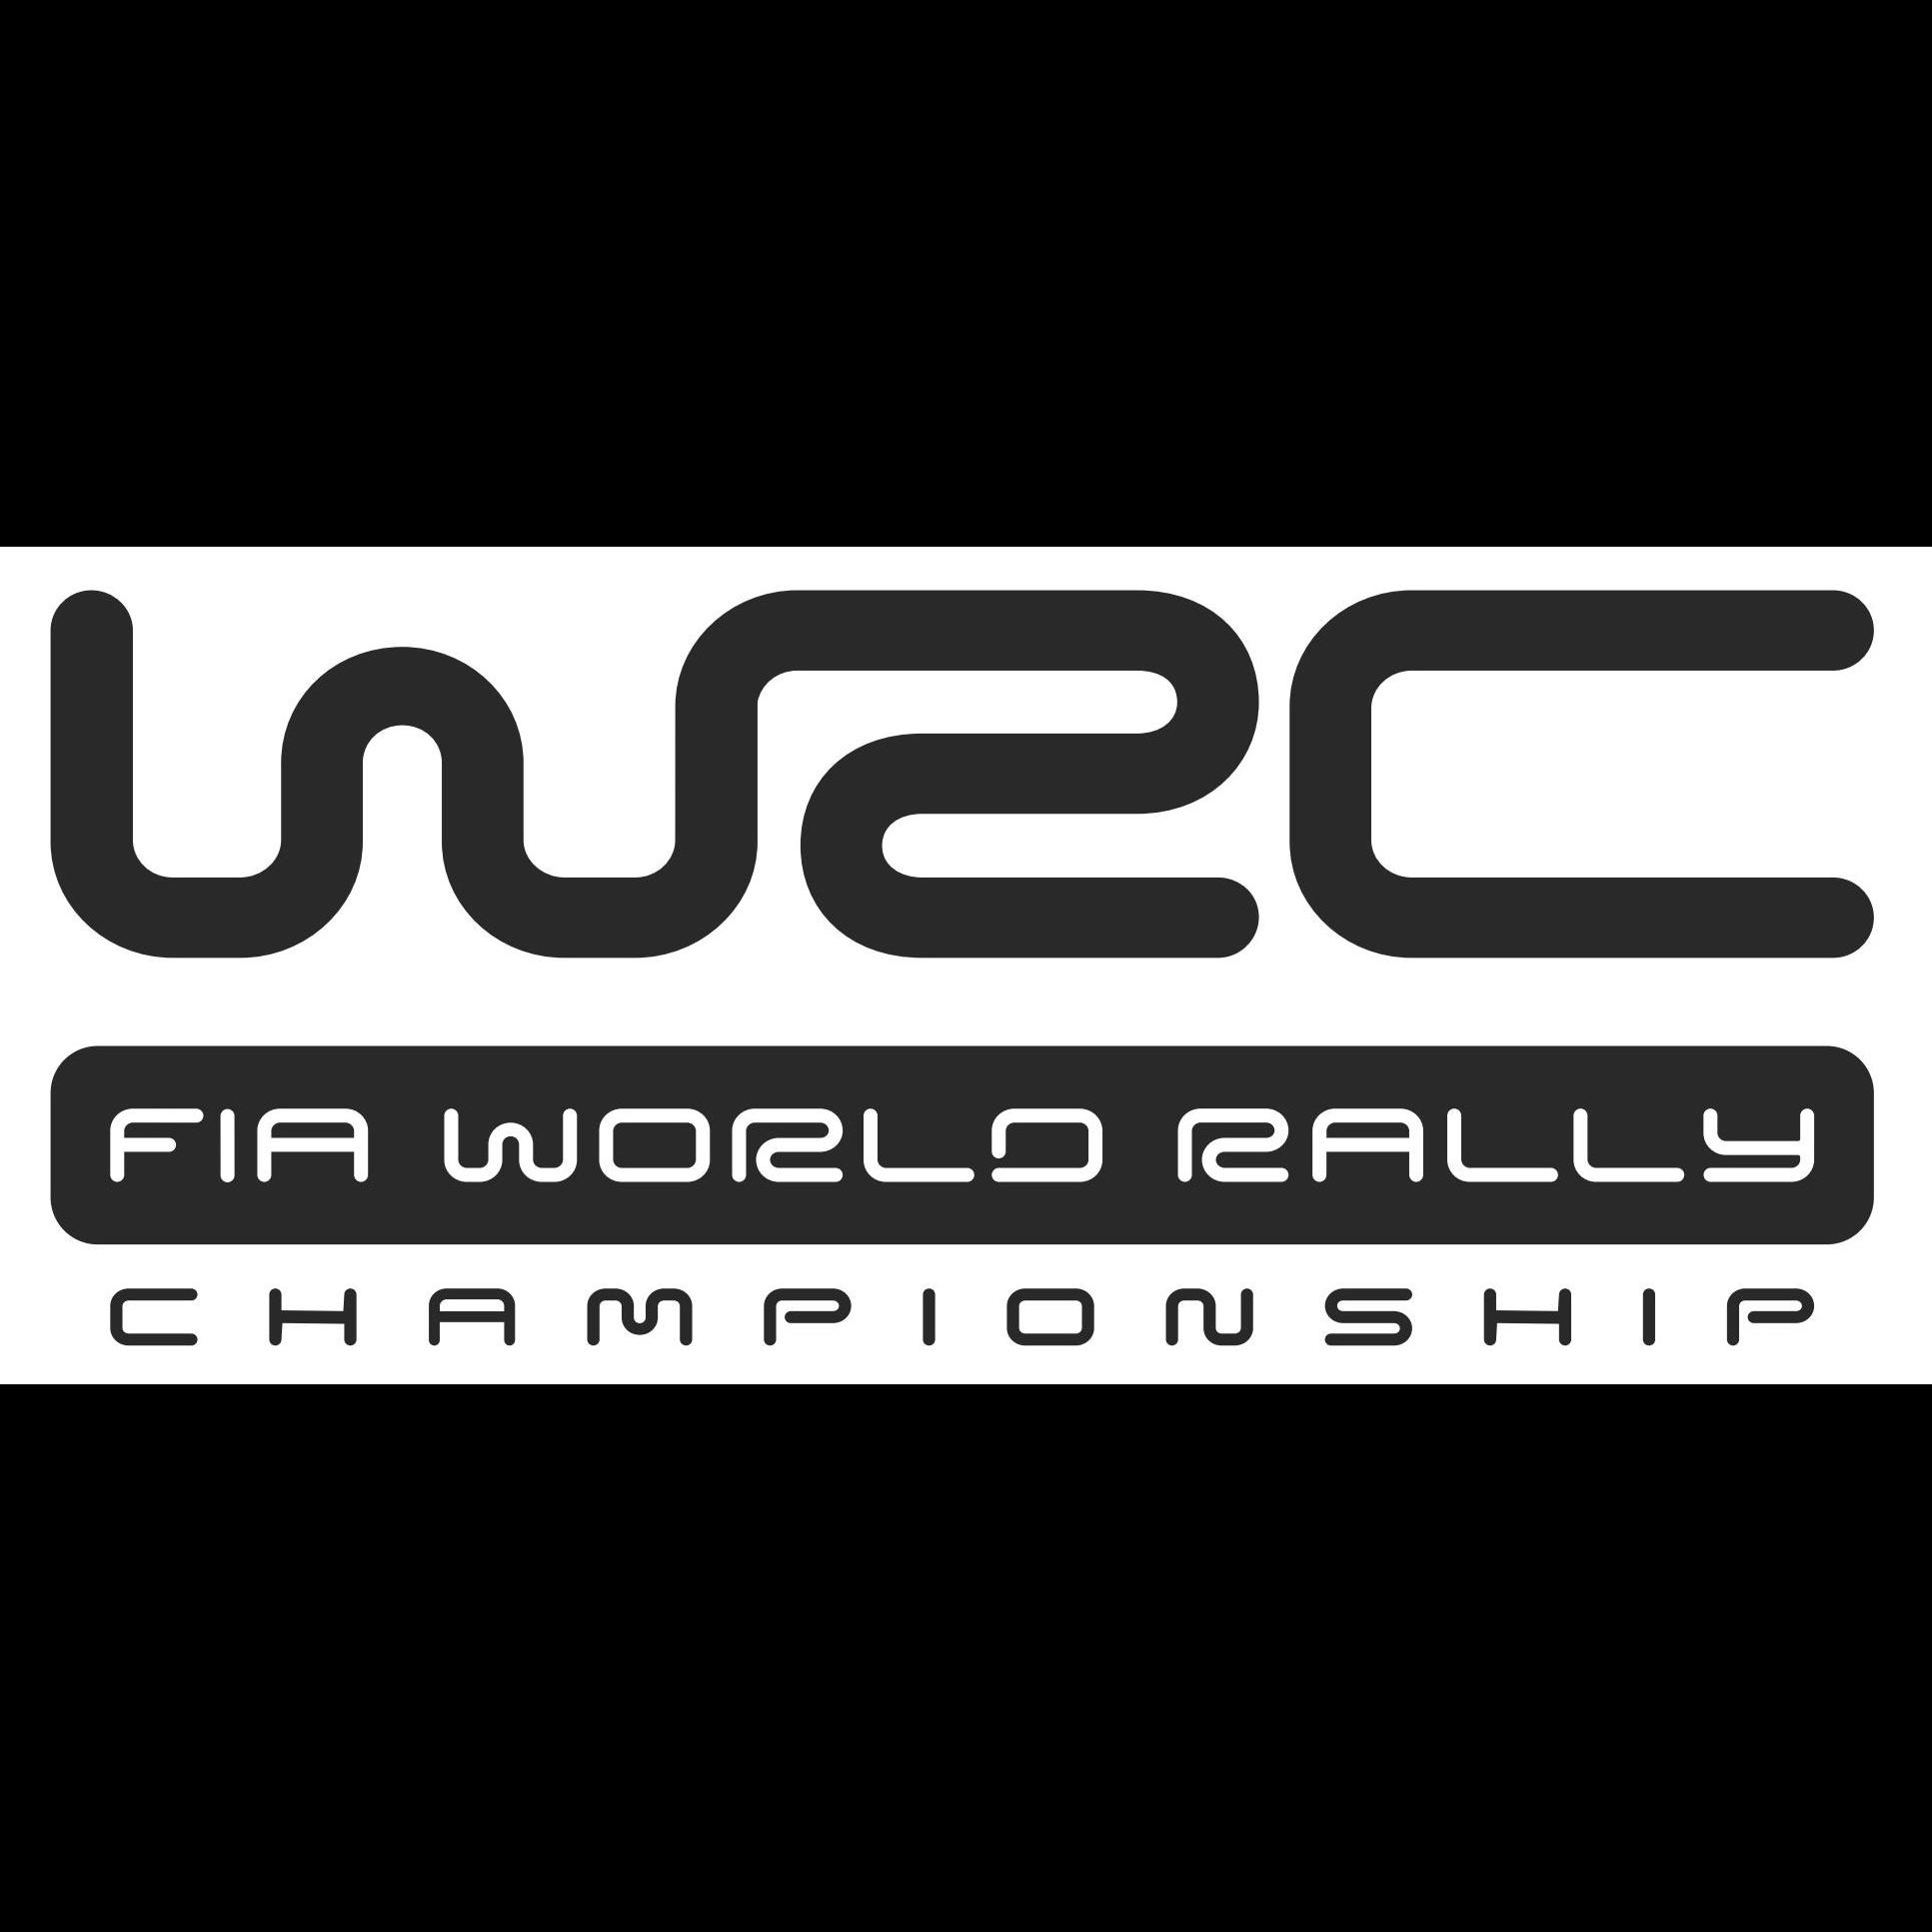 2015 World Rally Championship